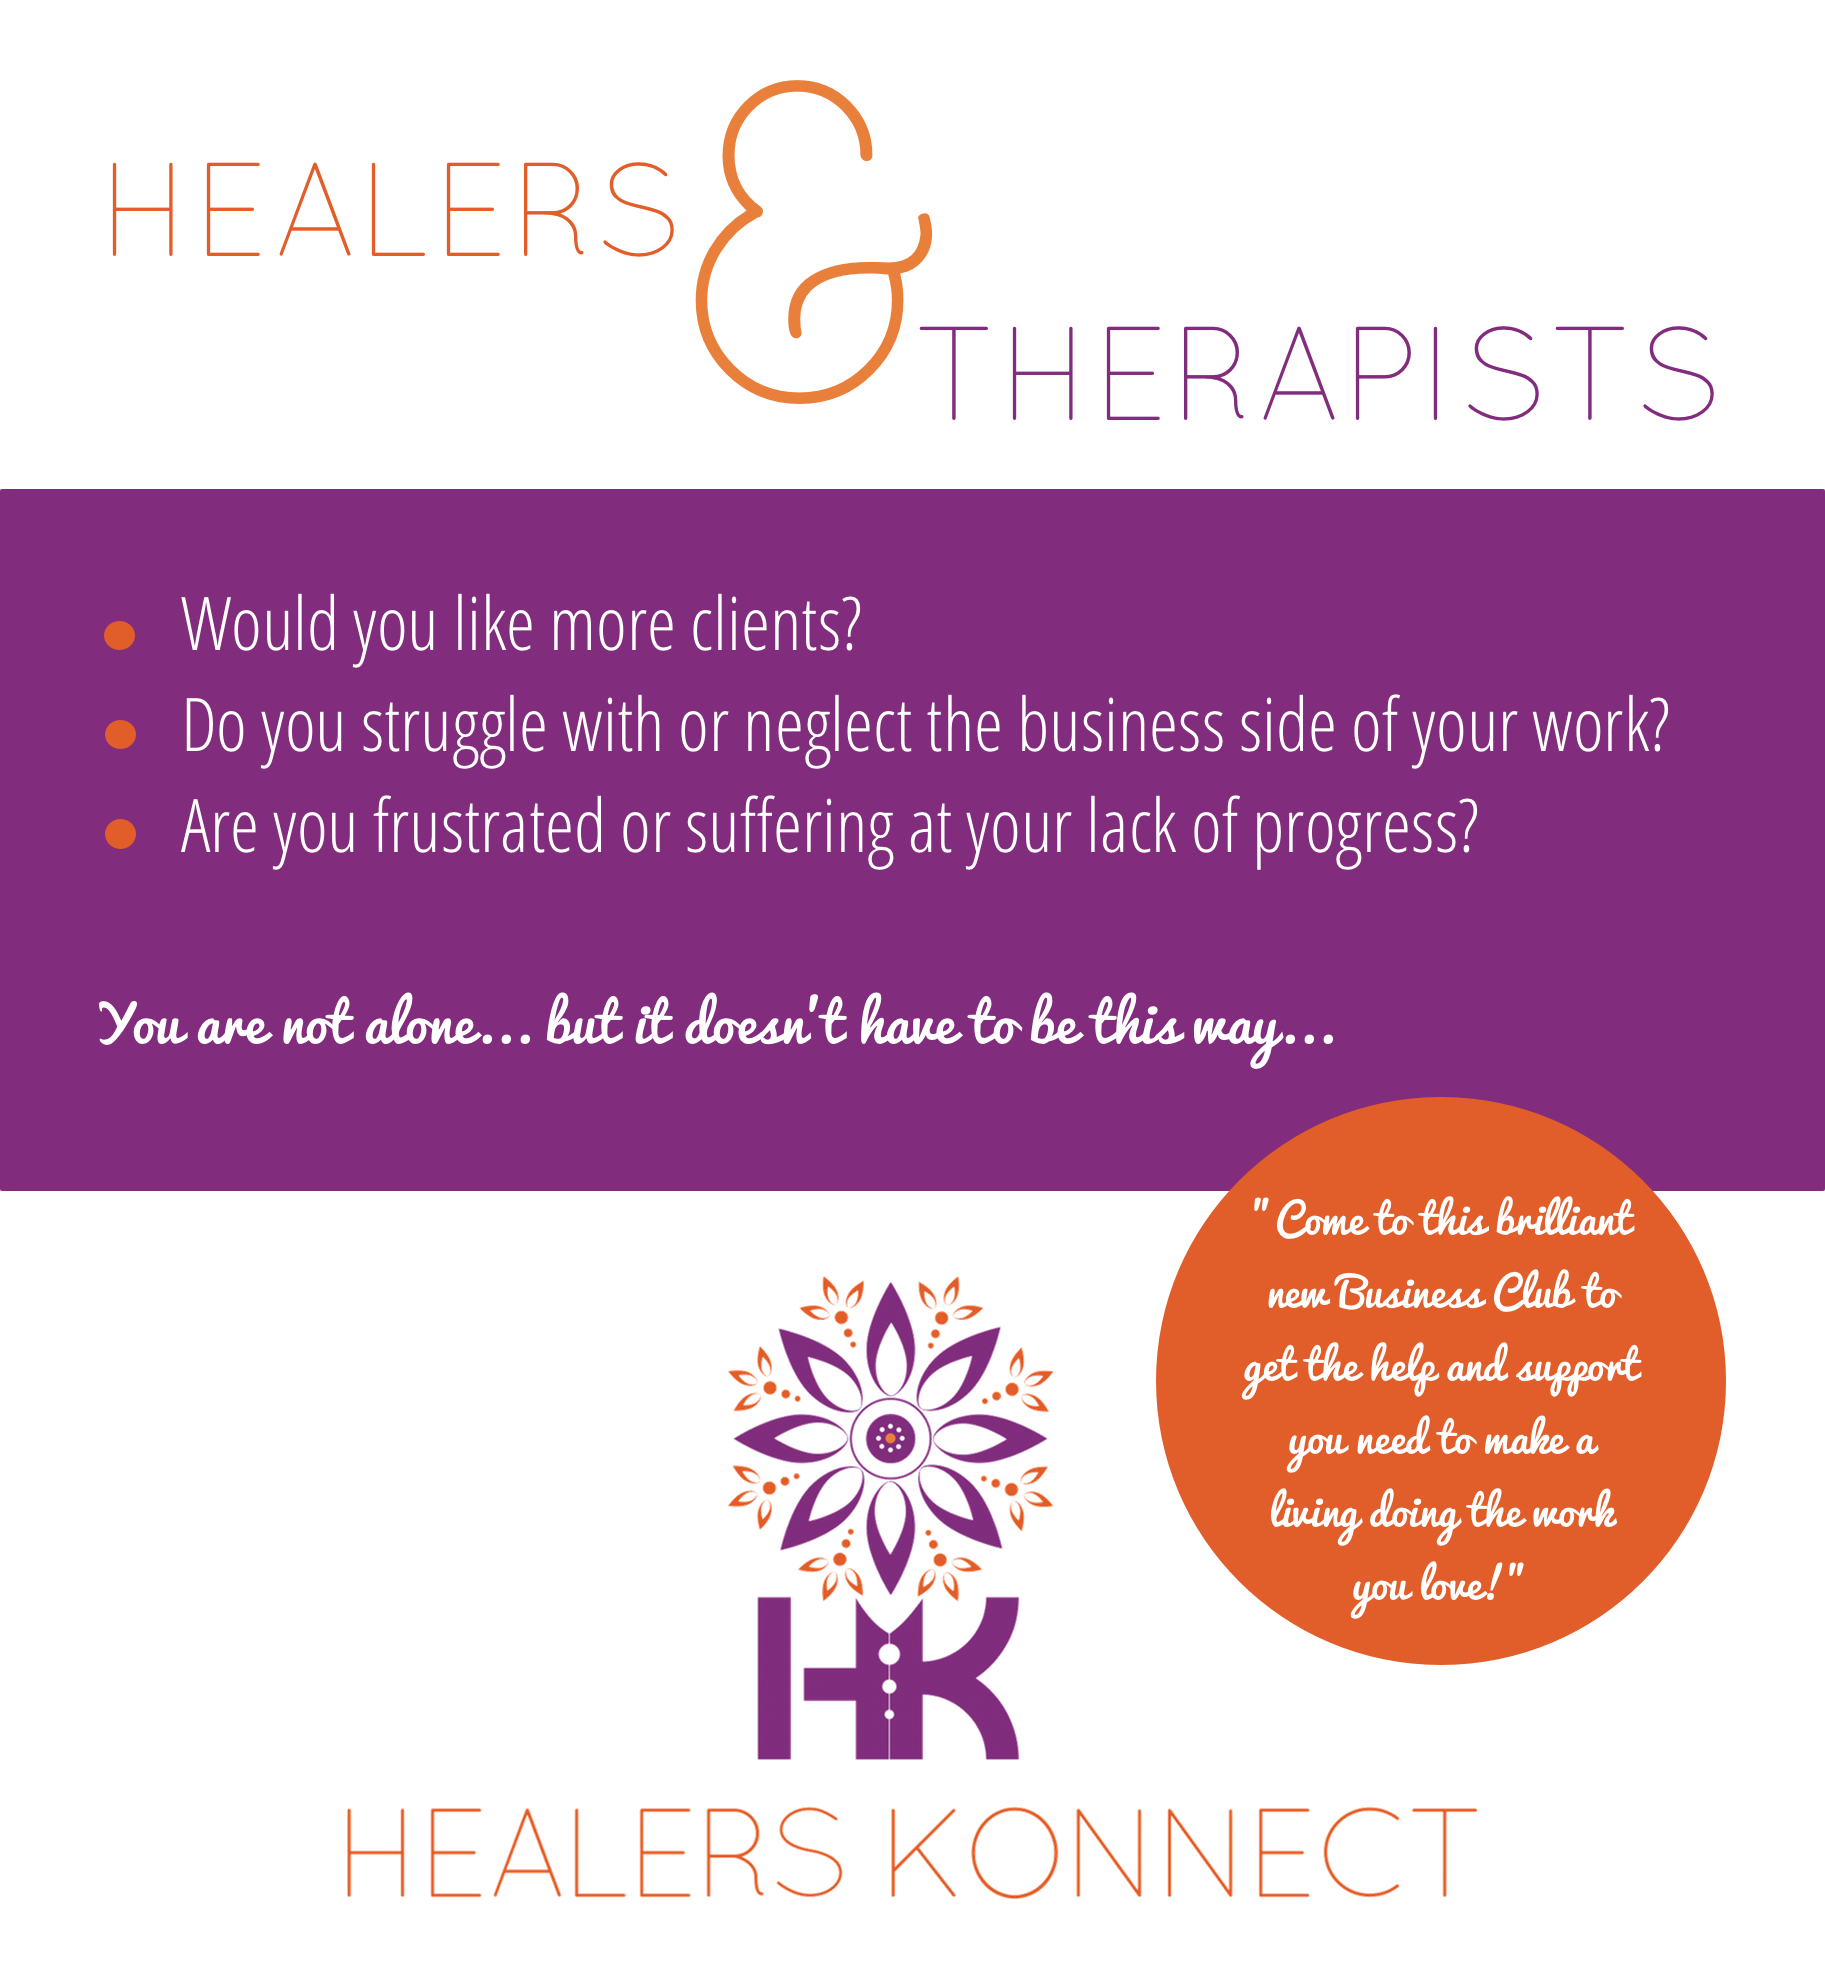 Healers Konnect